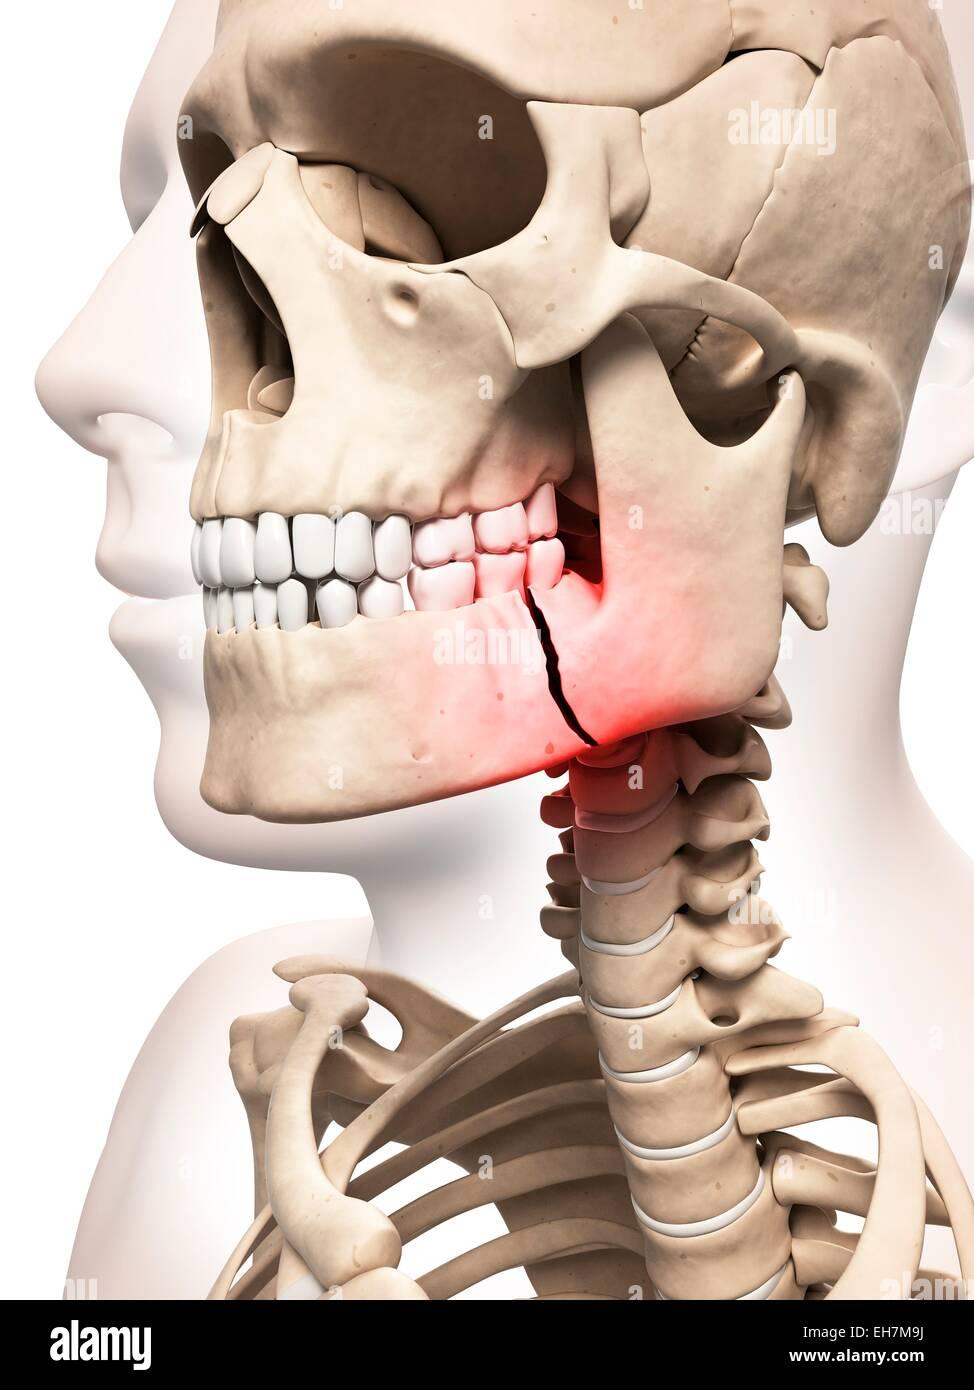 Broken Jaw Bone Illustration Stock Photo 79460238 Alamy